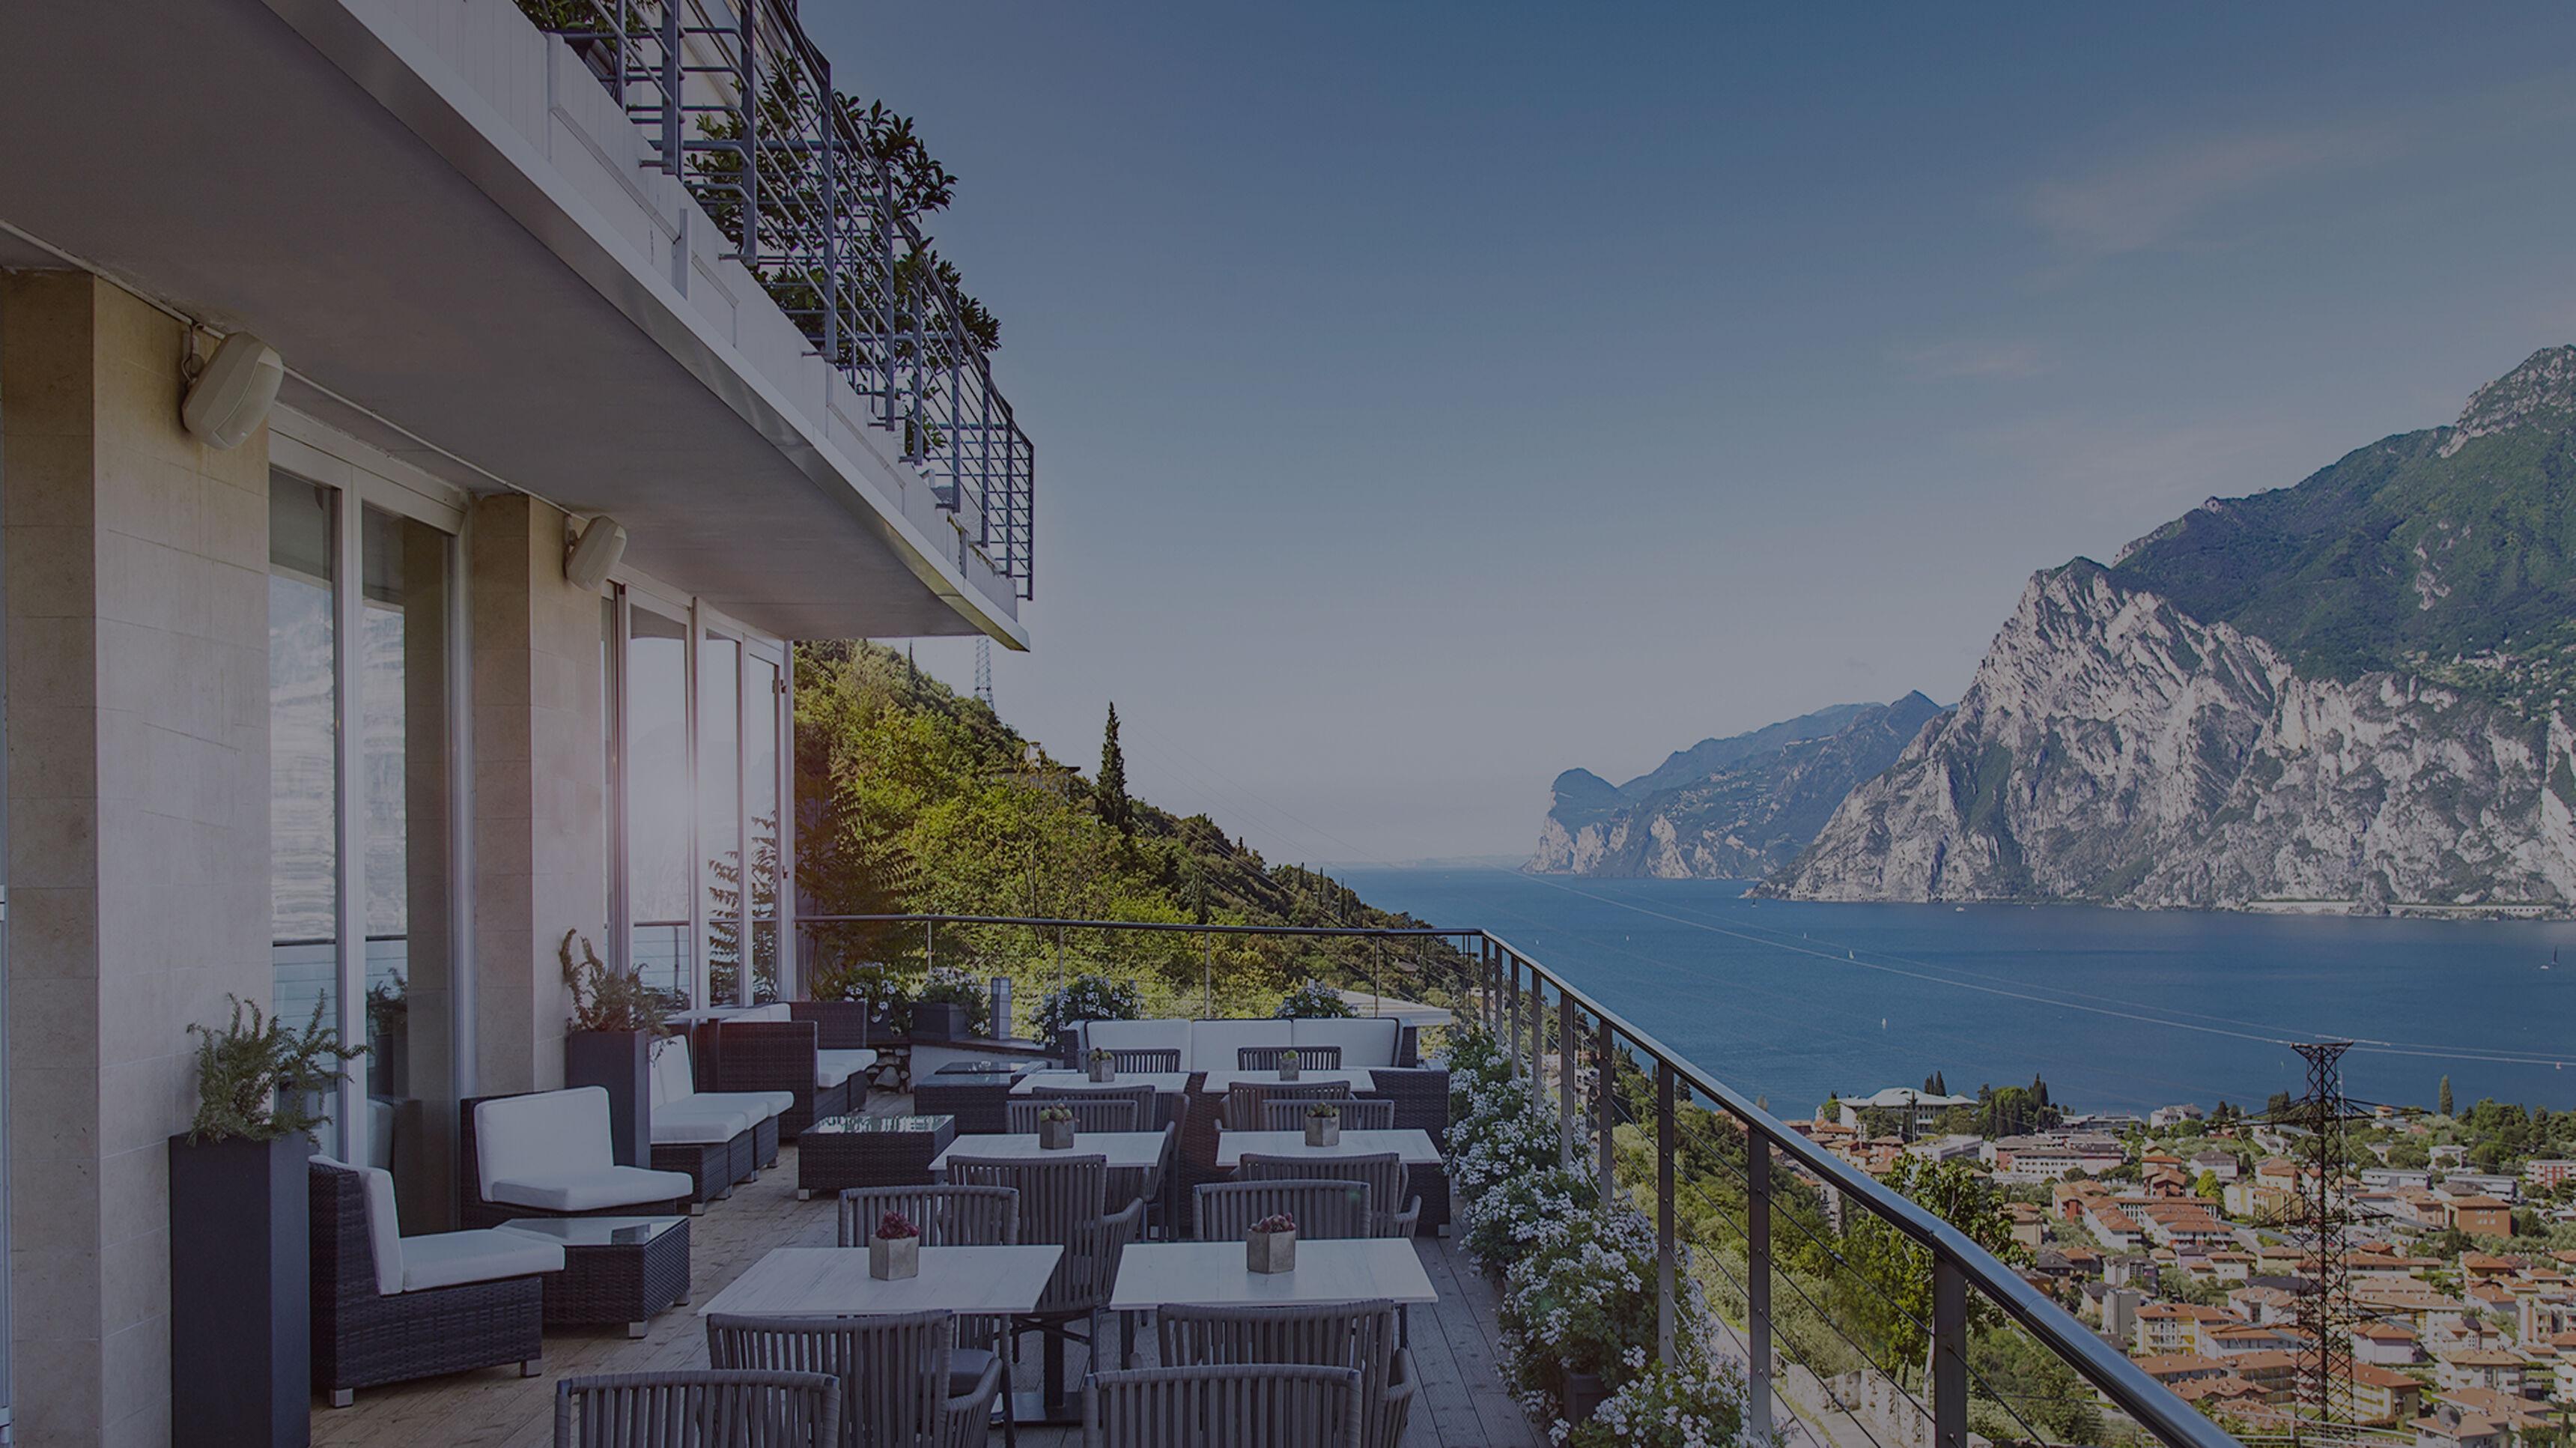 Hotel Forte Charme | 4 Sterne Hotel in Torbole sul Garda ...